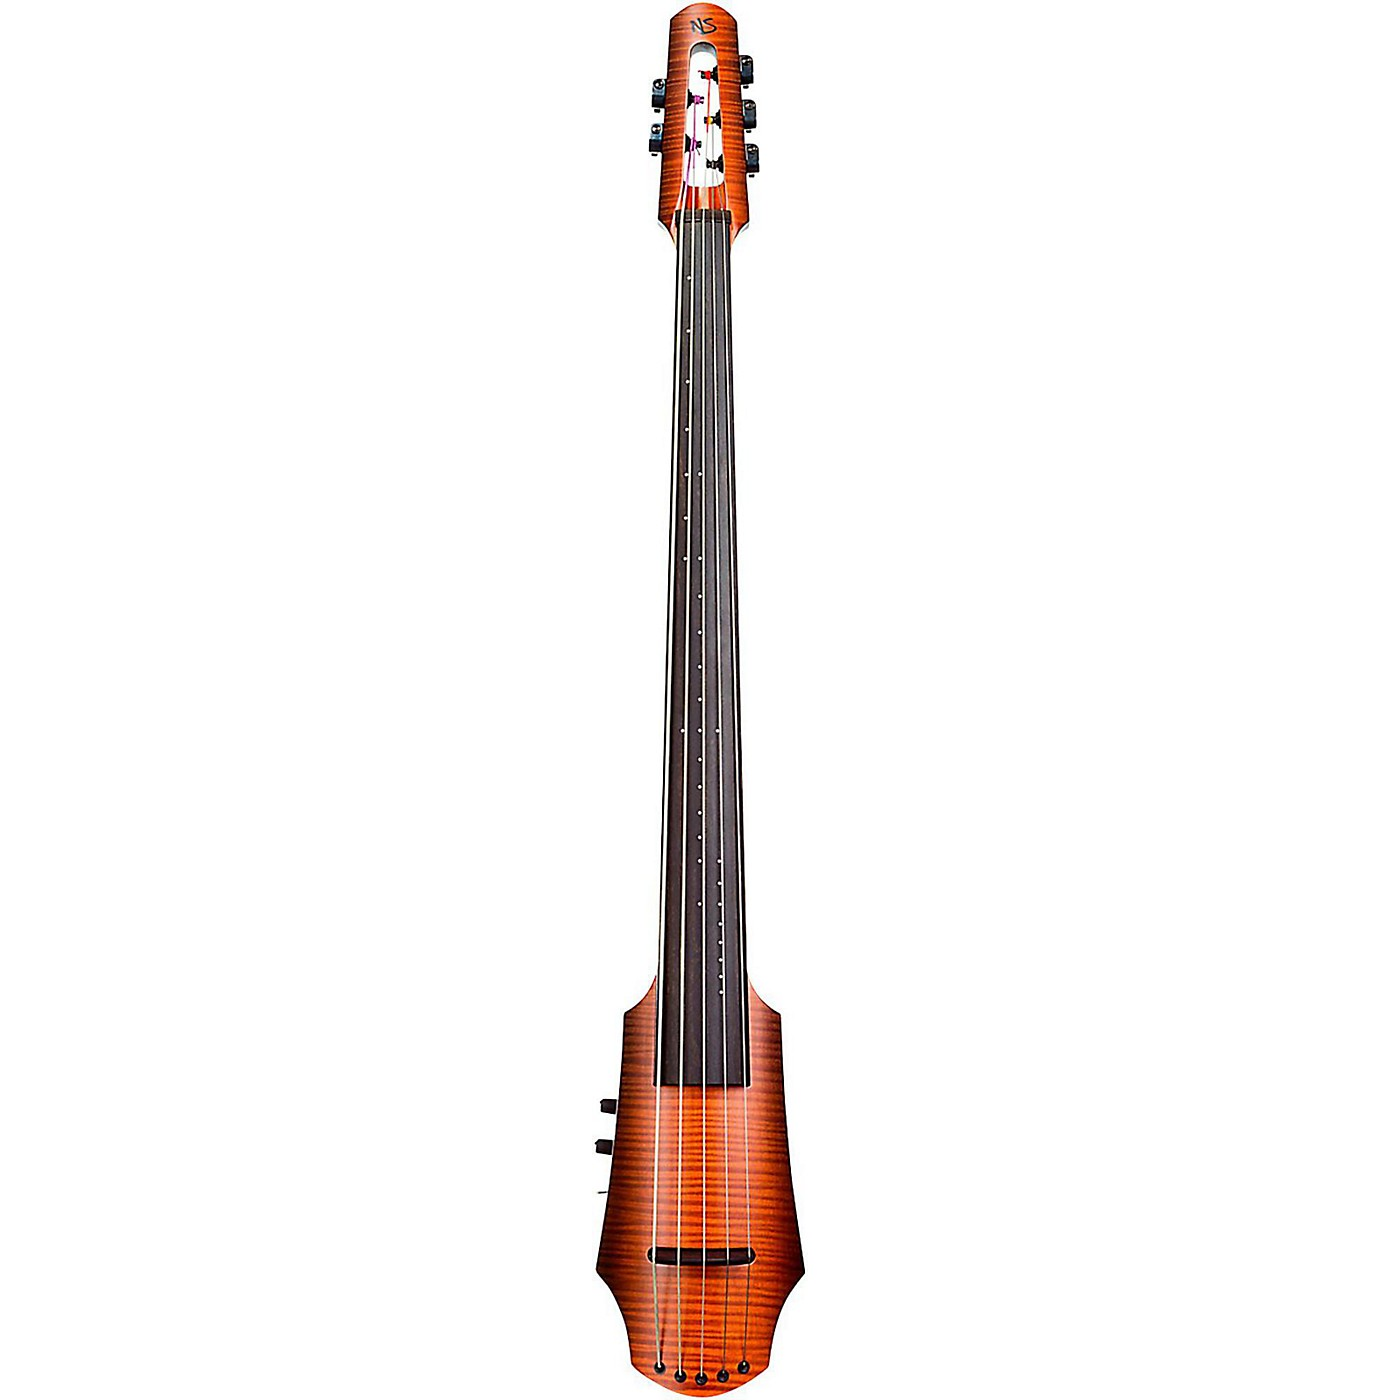 NS Design NXTa Active Series 5-String Electric Cello in Sunburst thumbnail